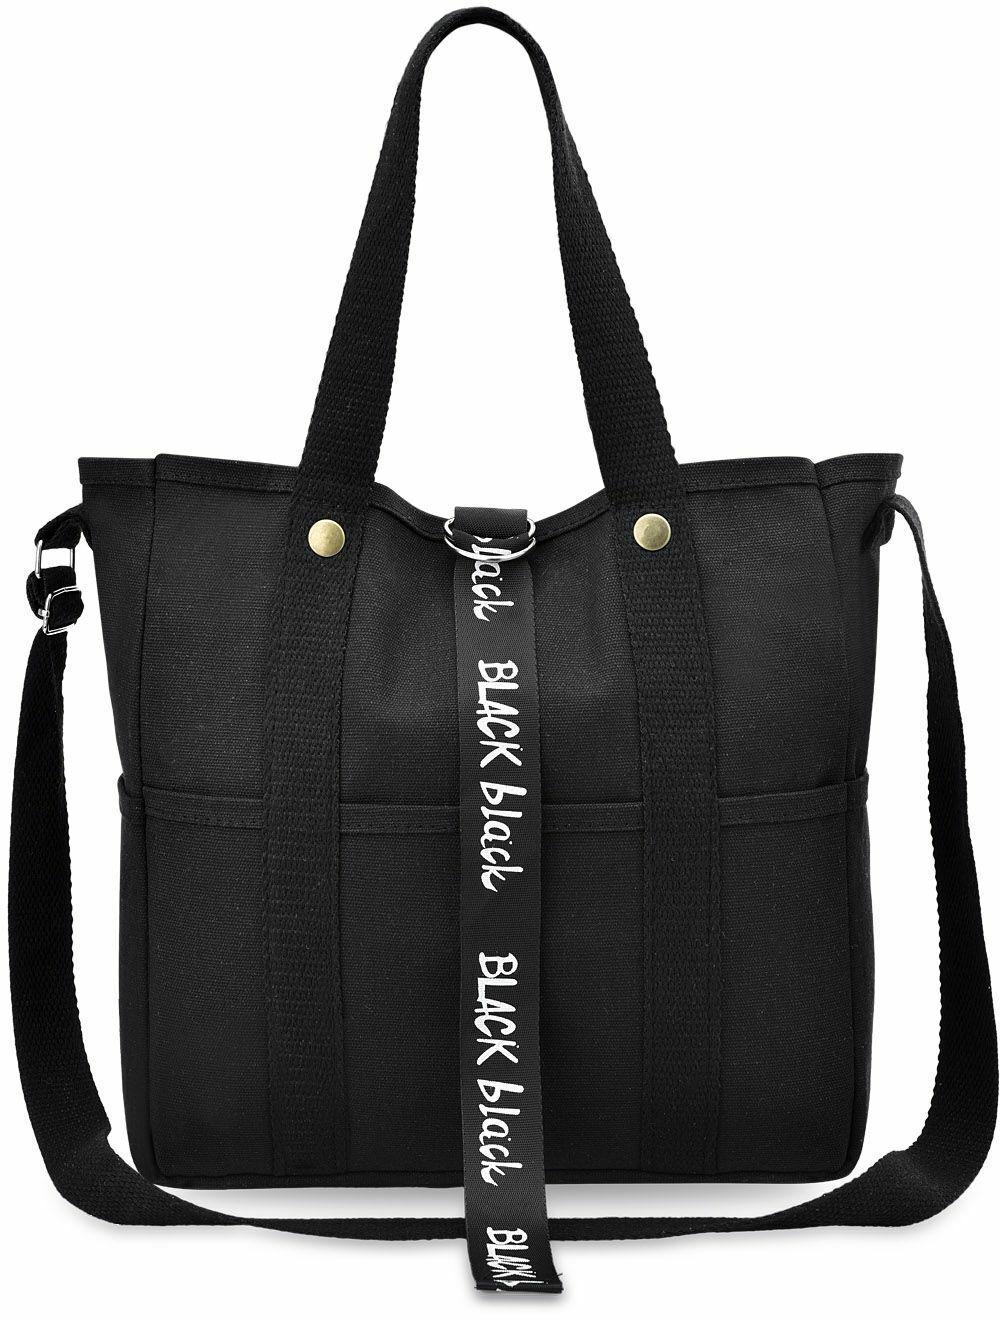 2154bfe71a923 große Leinentasche Damentasche Shopper Bag City Handtasche - Schwarz